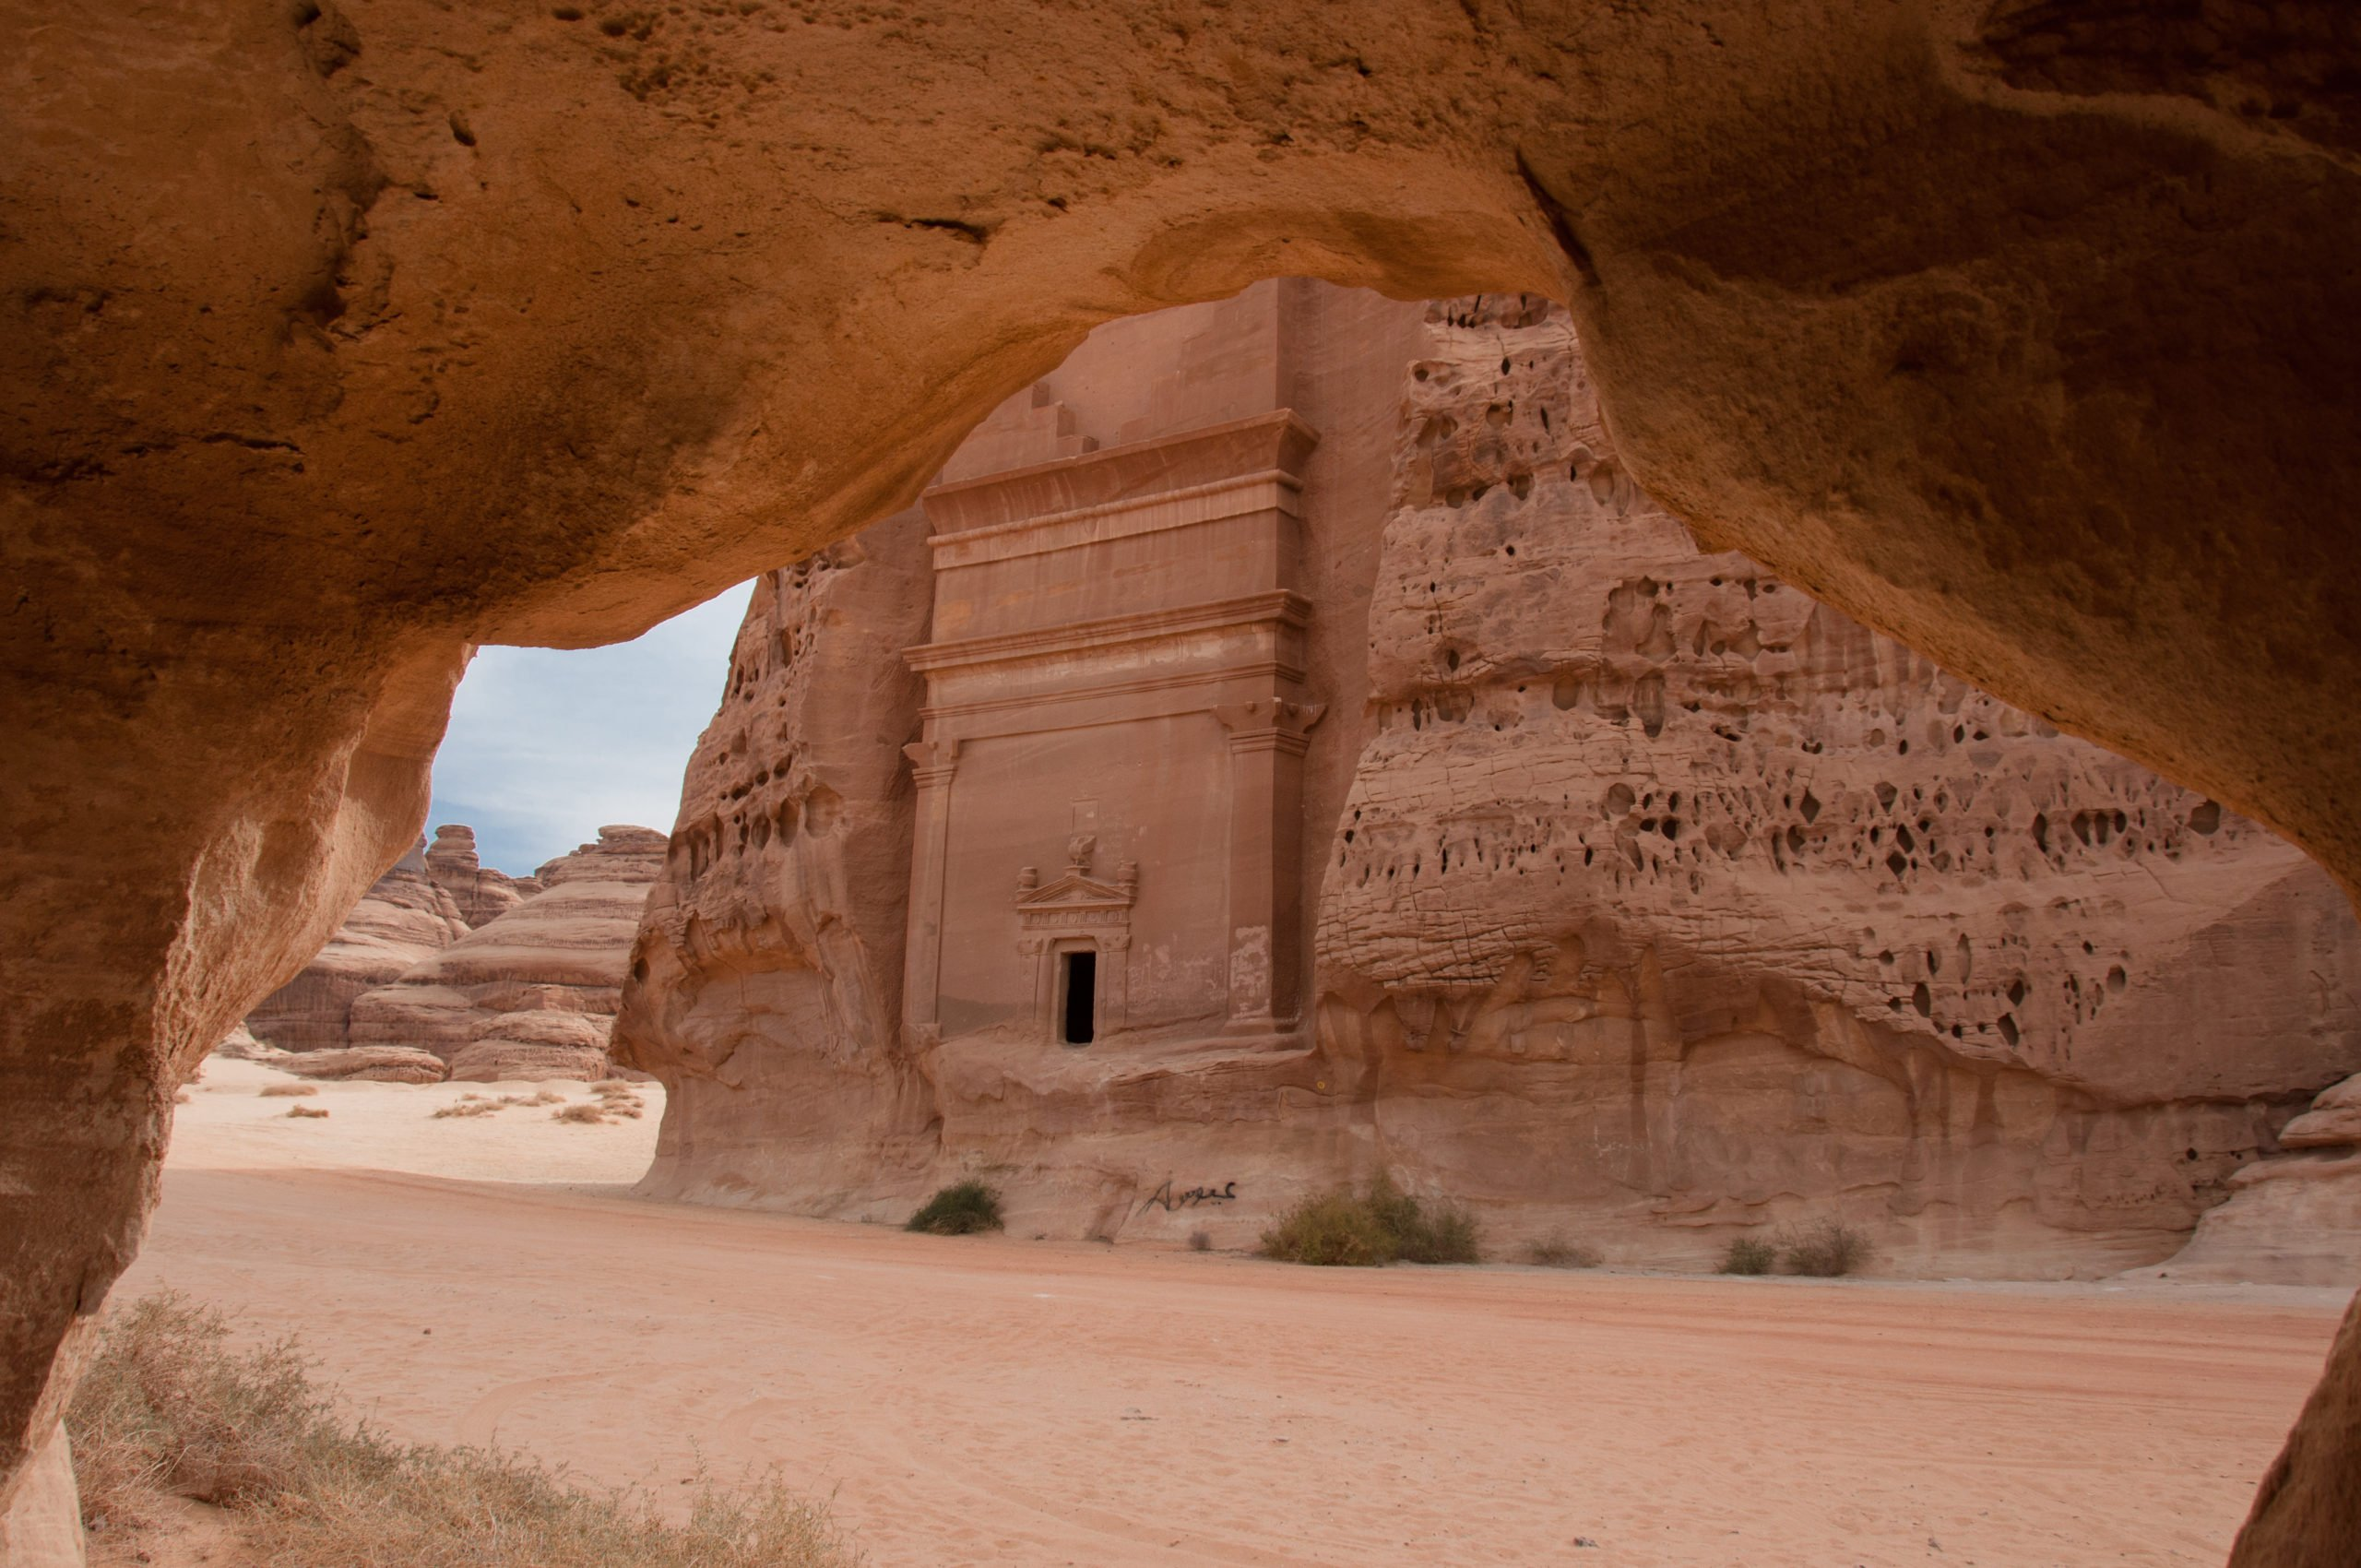 Explore The Tombs In Madain Saleh On The 13 Day Highlights Of Israel, Saudi Arabia & Jordan Package Tour